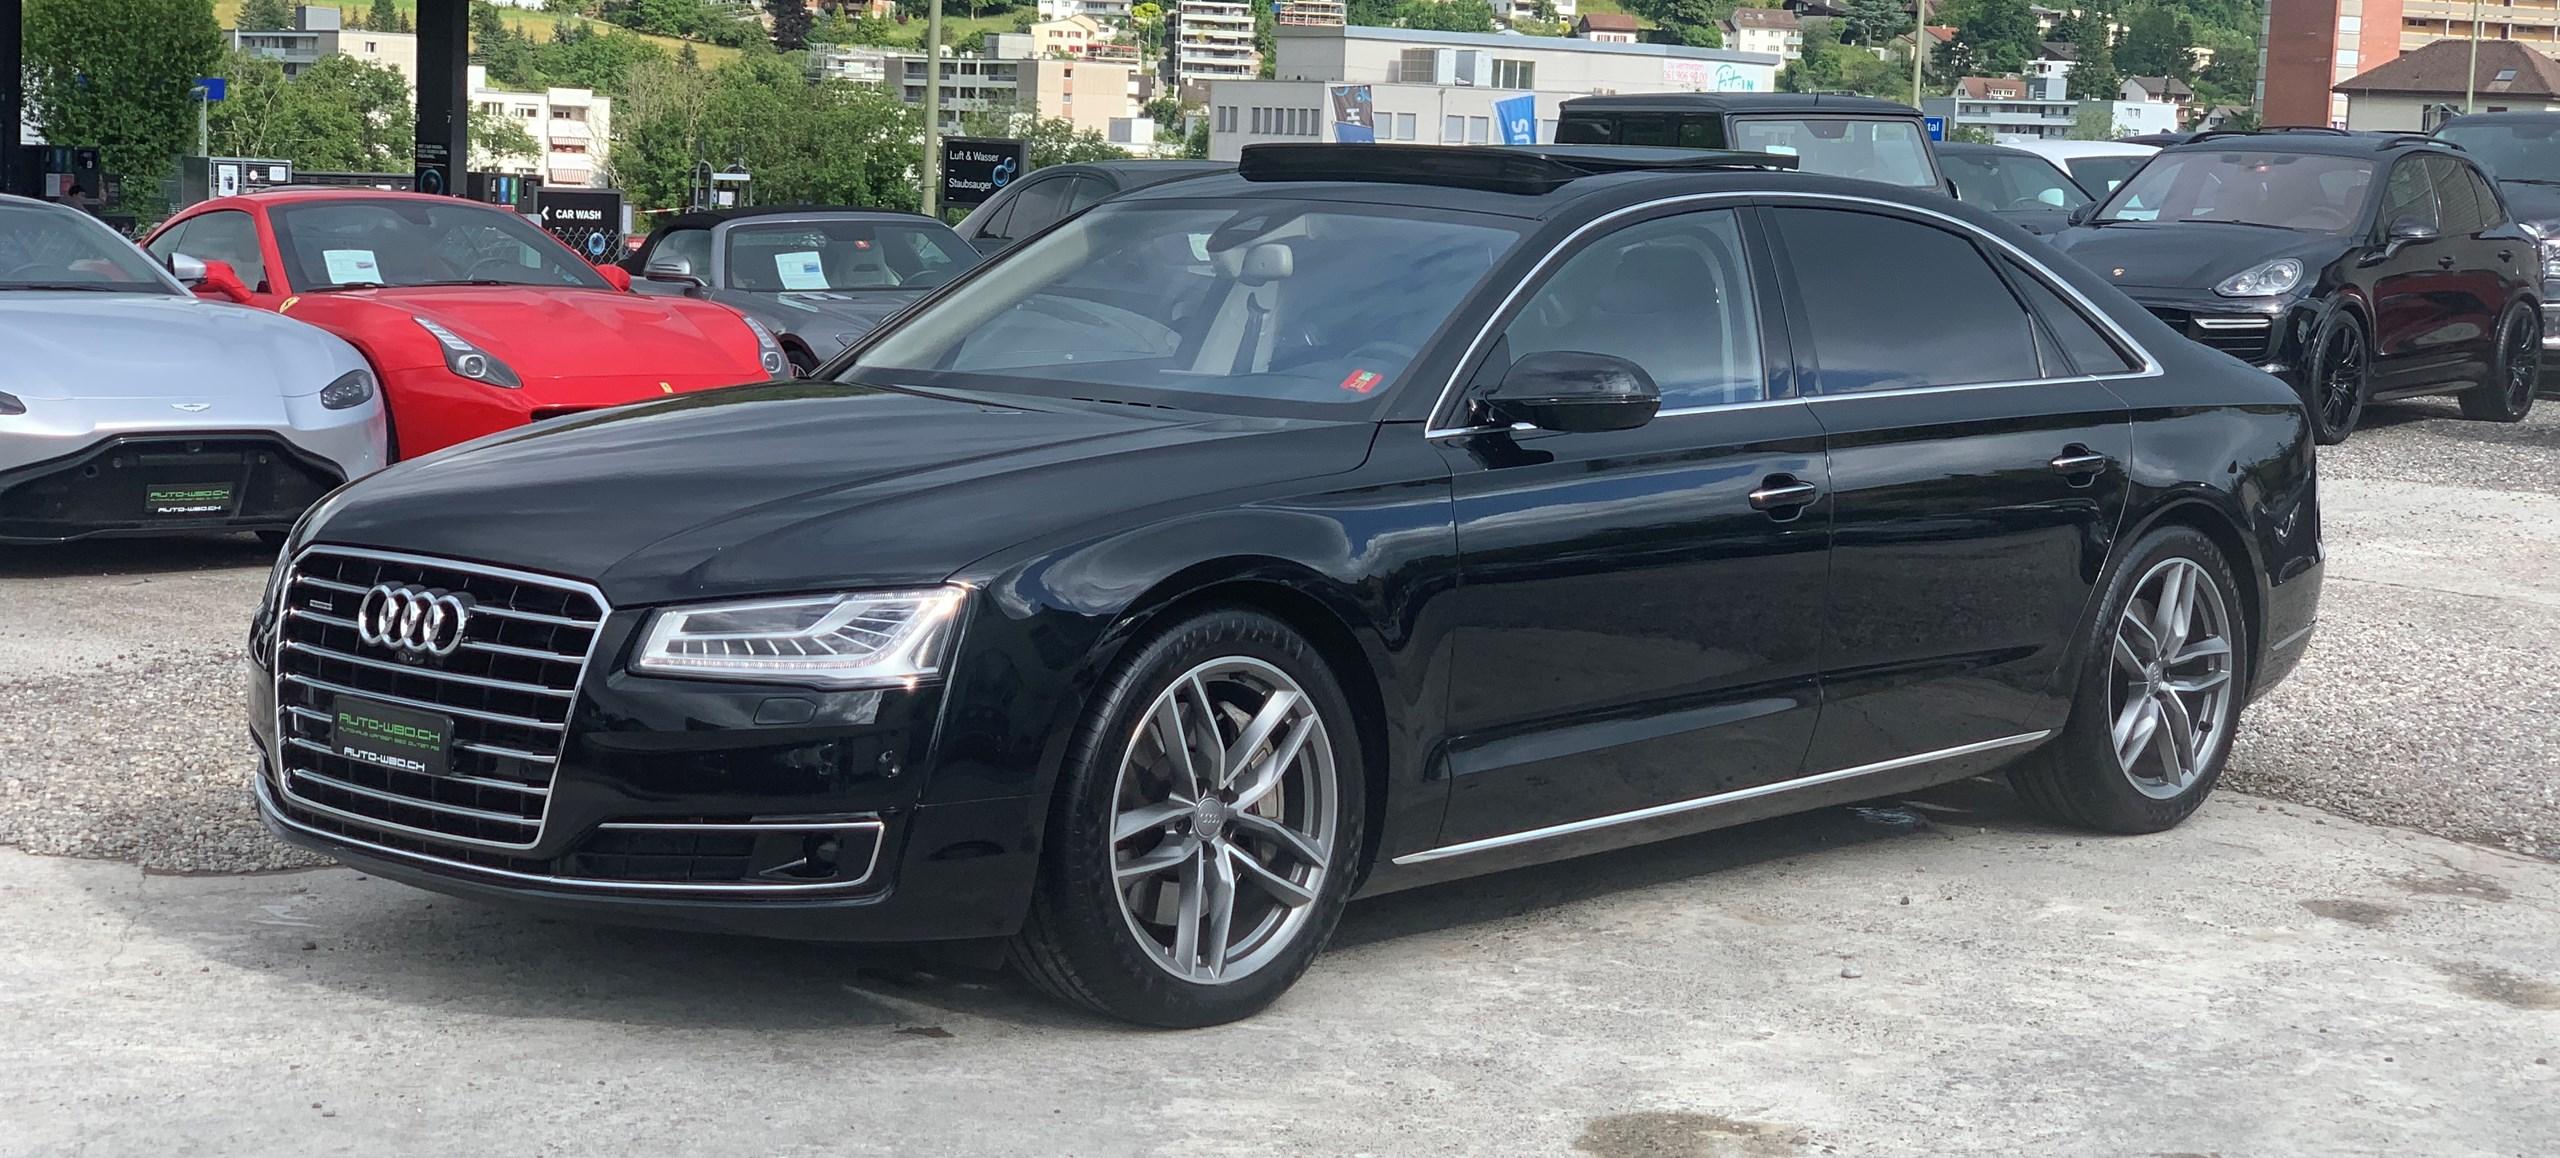 Kelebihan Audi A8 Tdi Murah Berkualitas